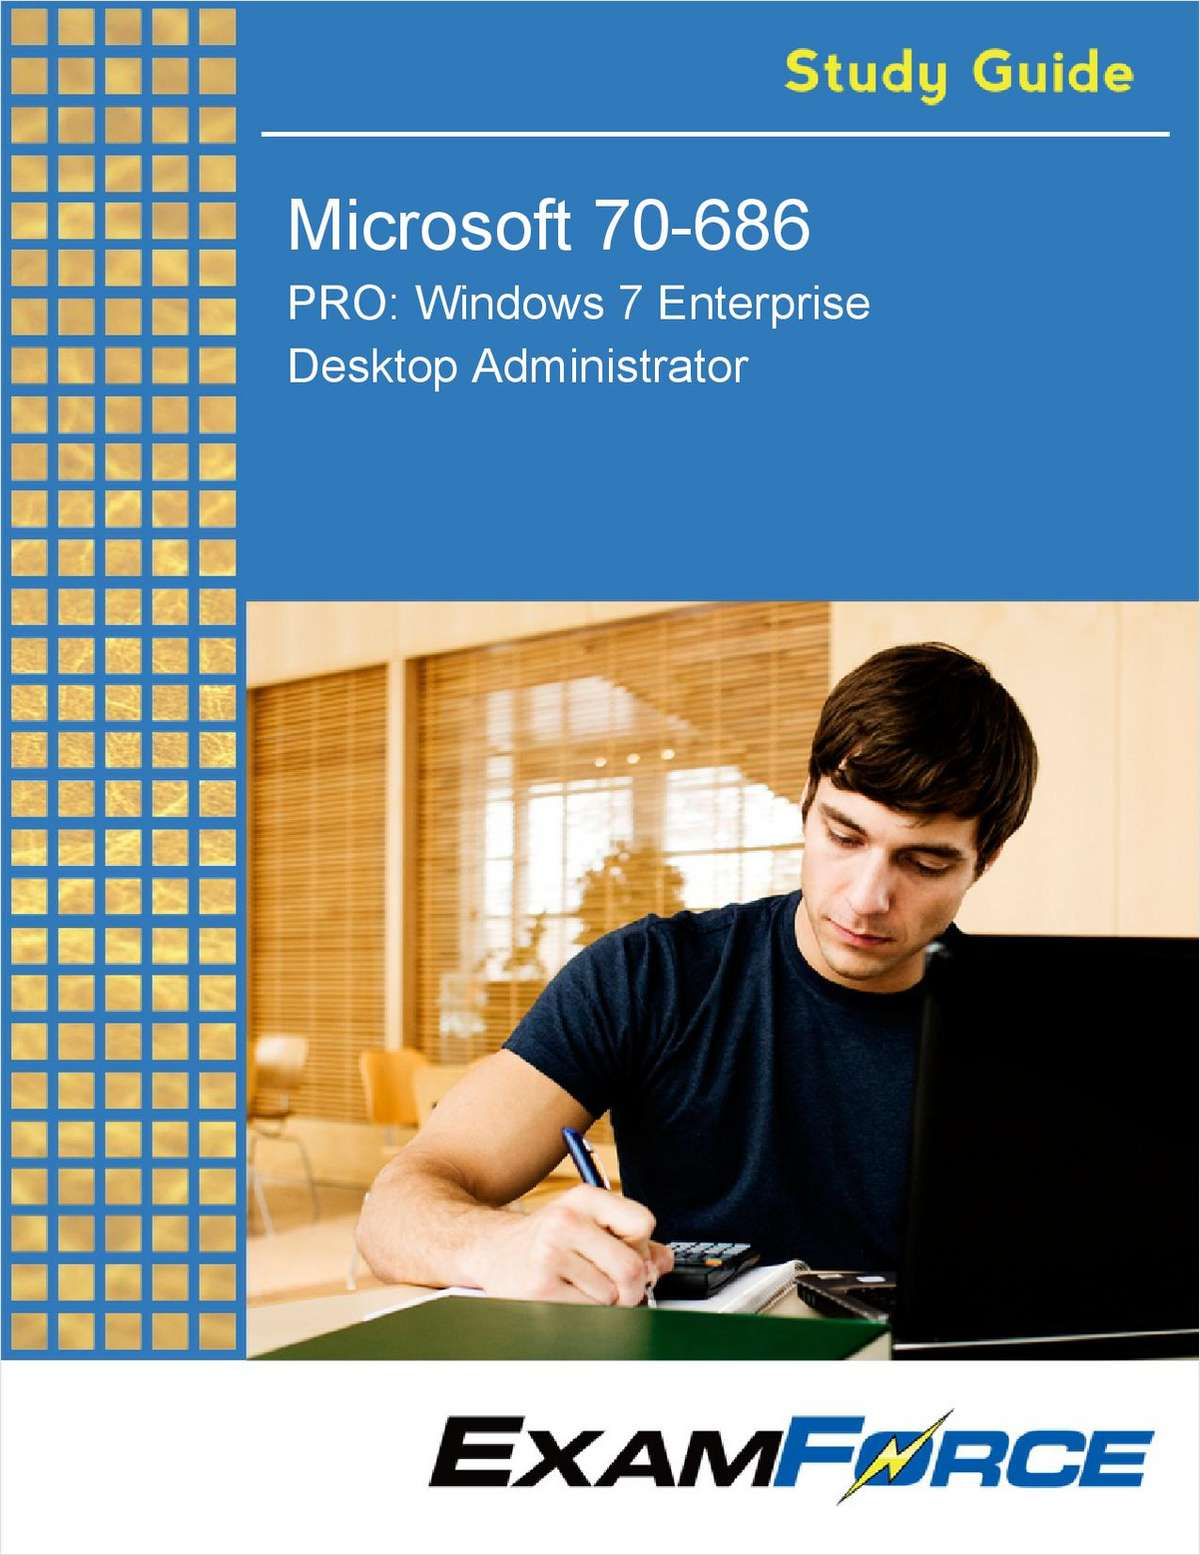 Microsoft 70-686 PRO: Windows 7 Enterprise Desktop Administrator (FREE Study Guide)